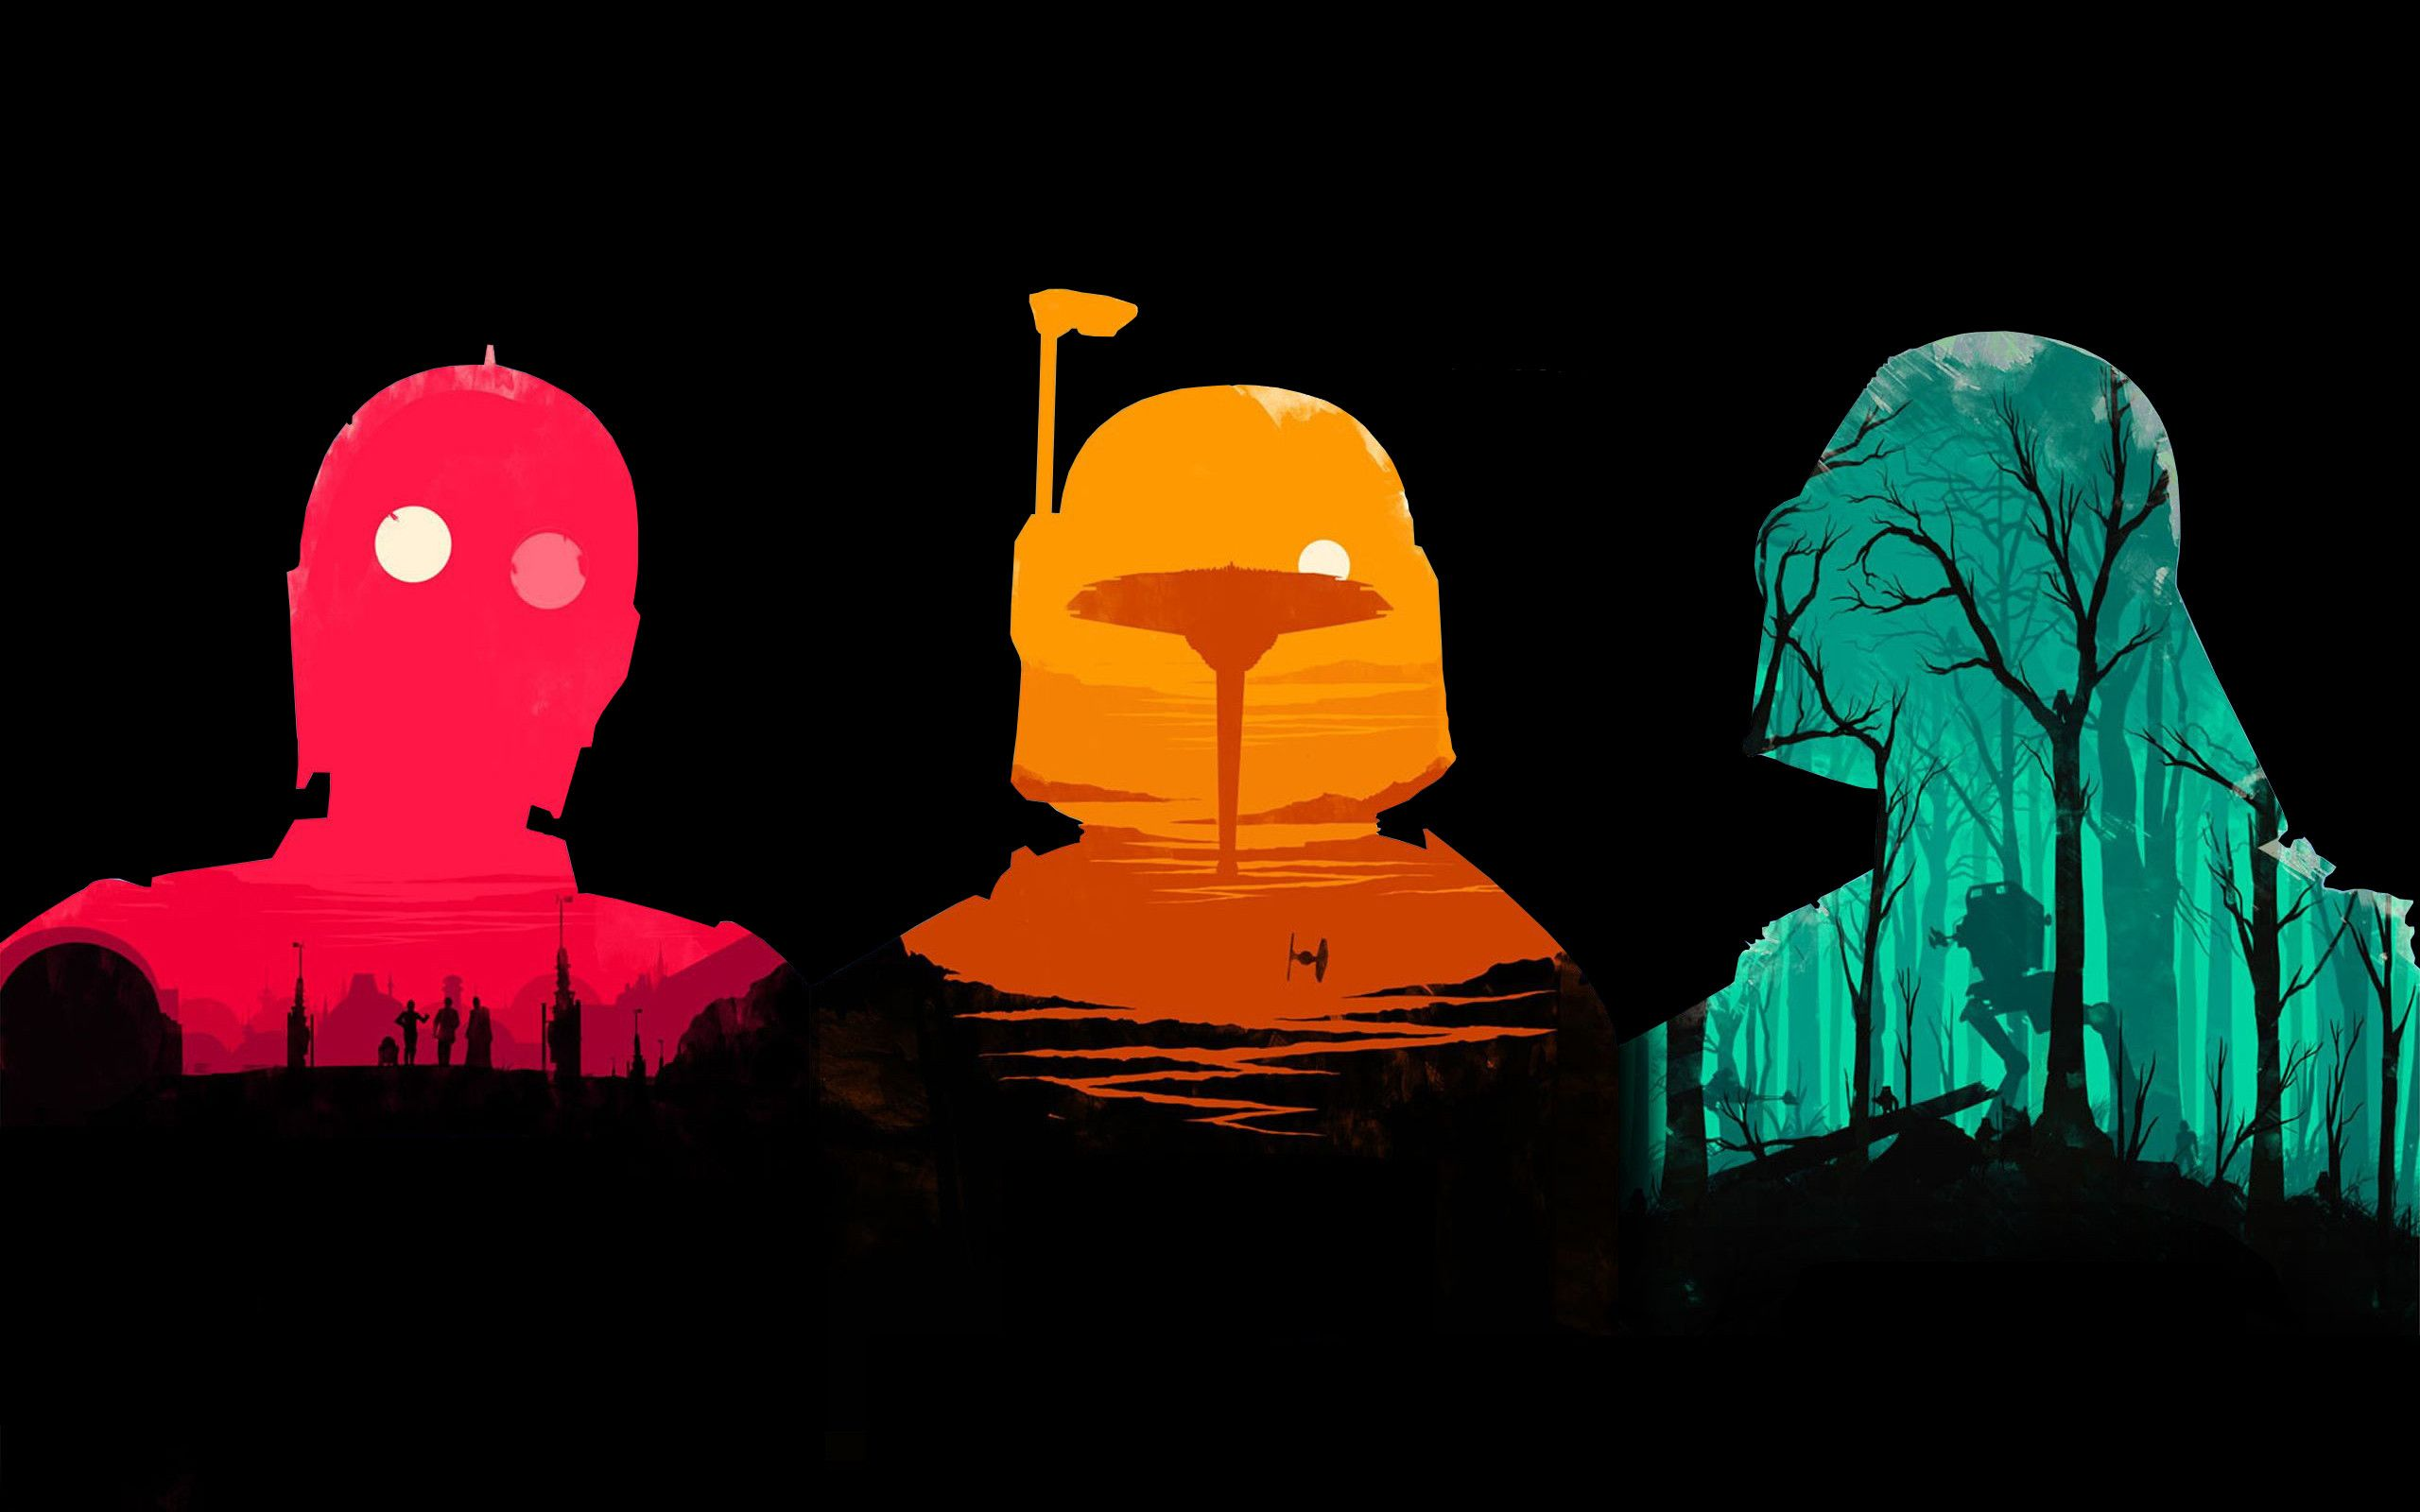 Over 1000 1080p Wallpapers Geeky Wallpaper Nerdy Wallpaper Star Wars Wallpaper